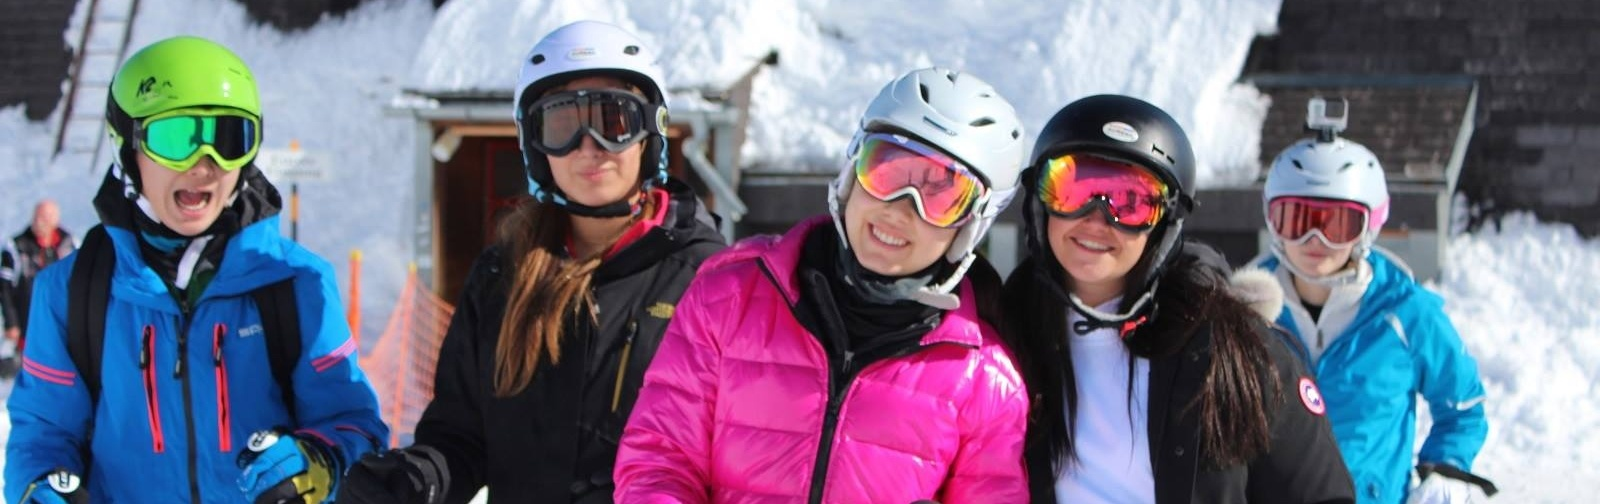 International School Ski Trip 2016